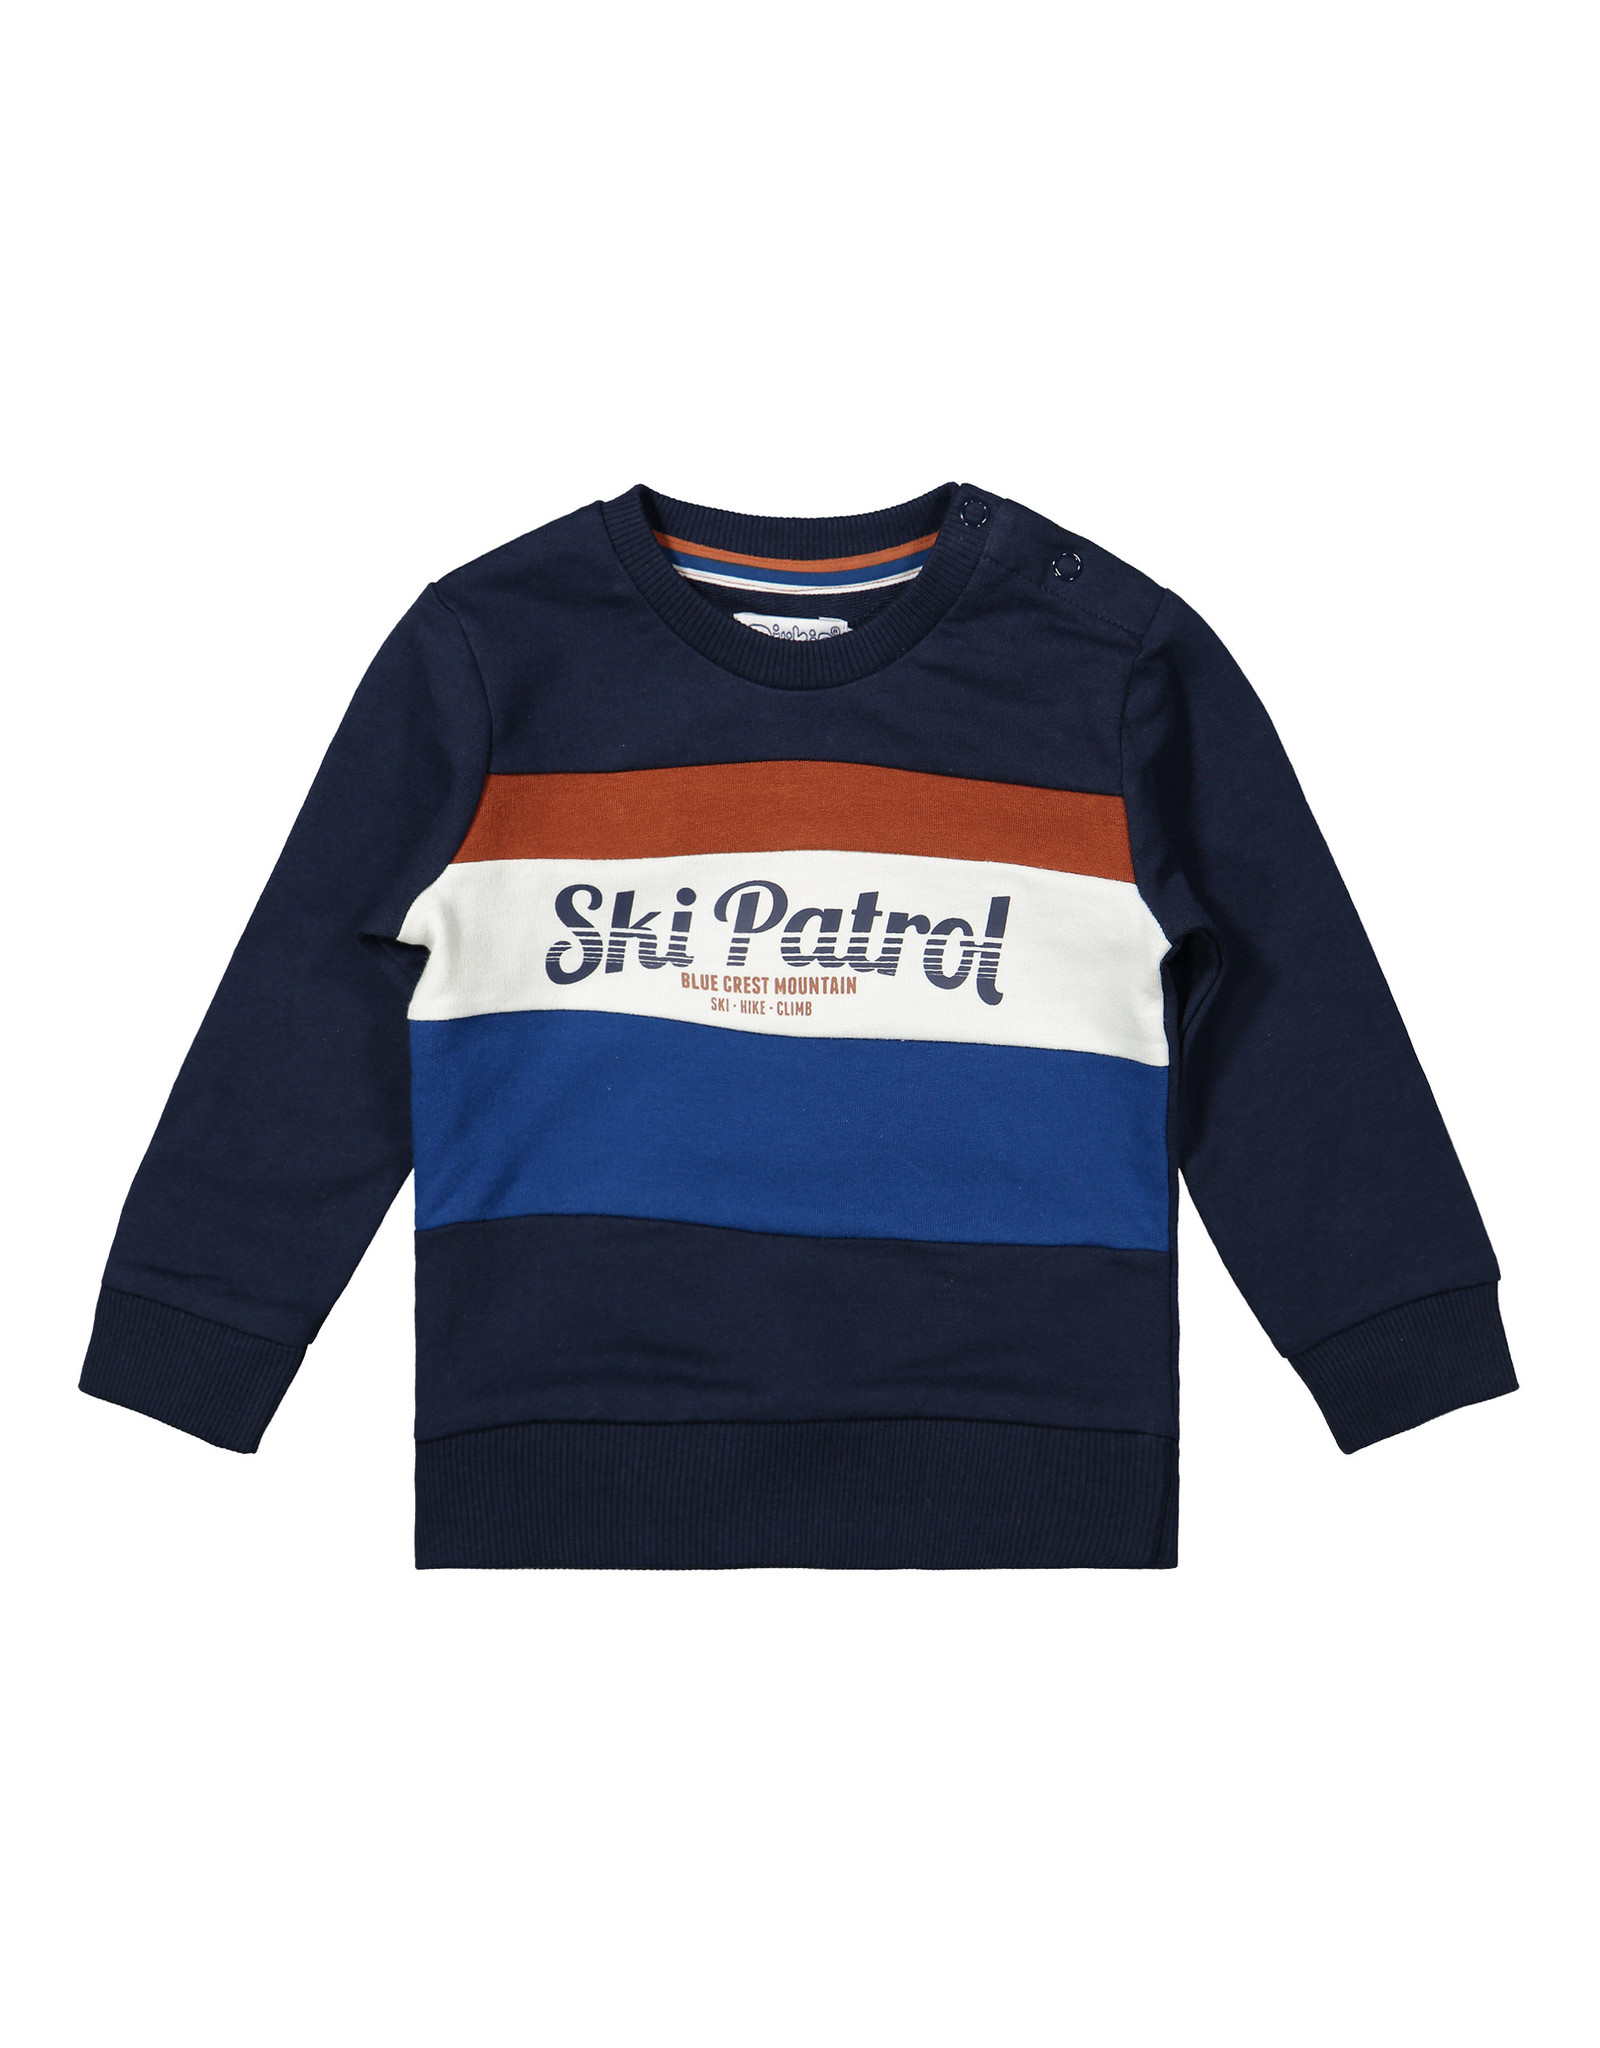 Dirkje Dirkje baby jongens sweater Ski Patrol Color Block Navy